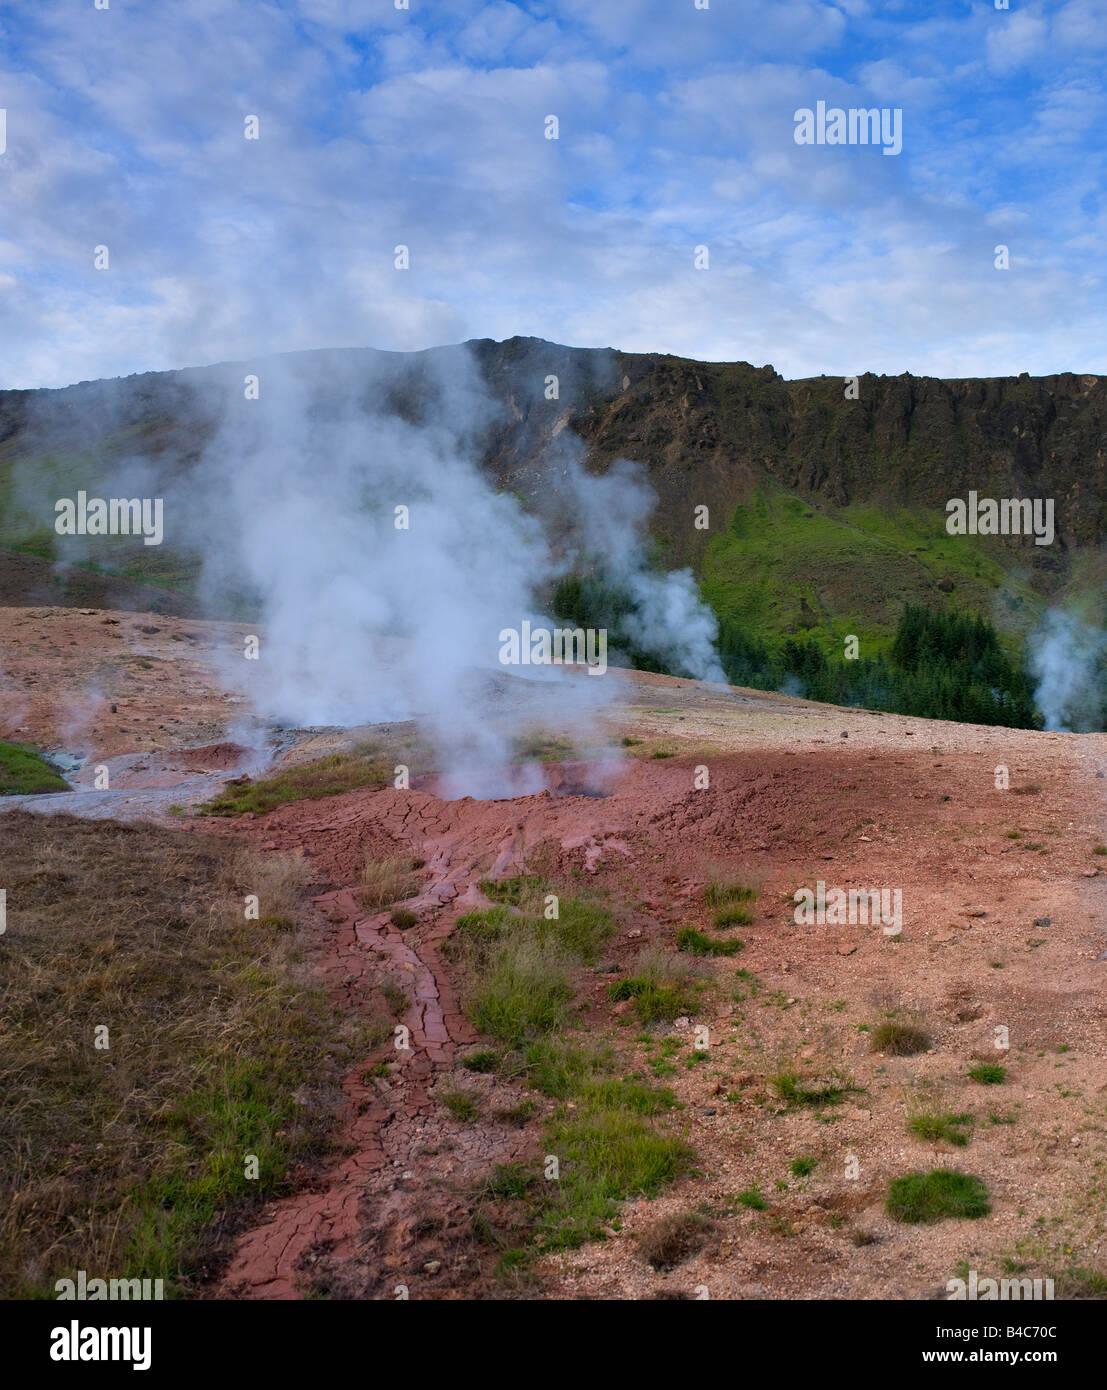 Nuova energia geotermica di germogliazione di geyser e fori dal recente terremoto, Hveragerdi Town, vicino a Reykjavik Immagini Stock